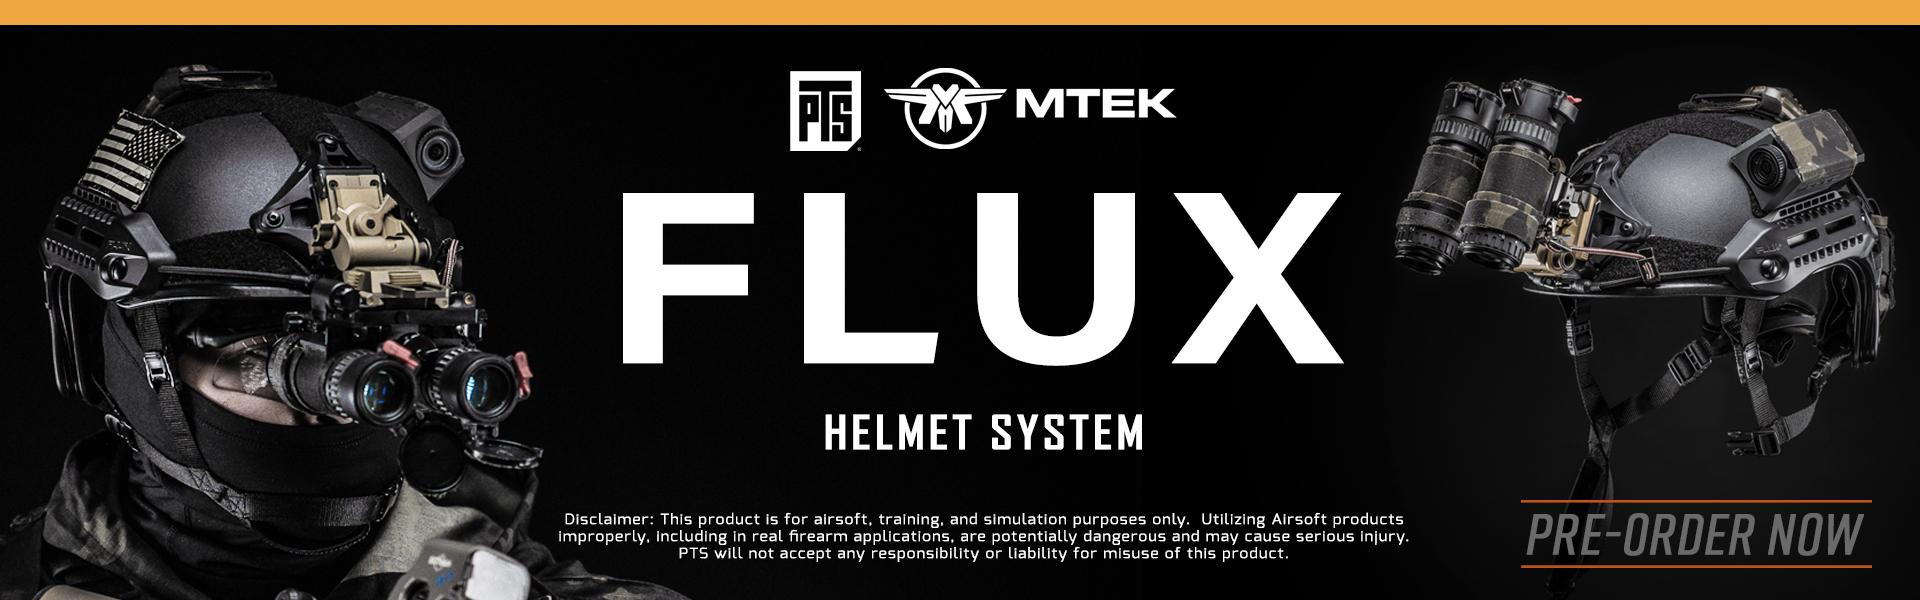 pts steel shop,pts,mtek,flux,helmet,